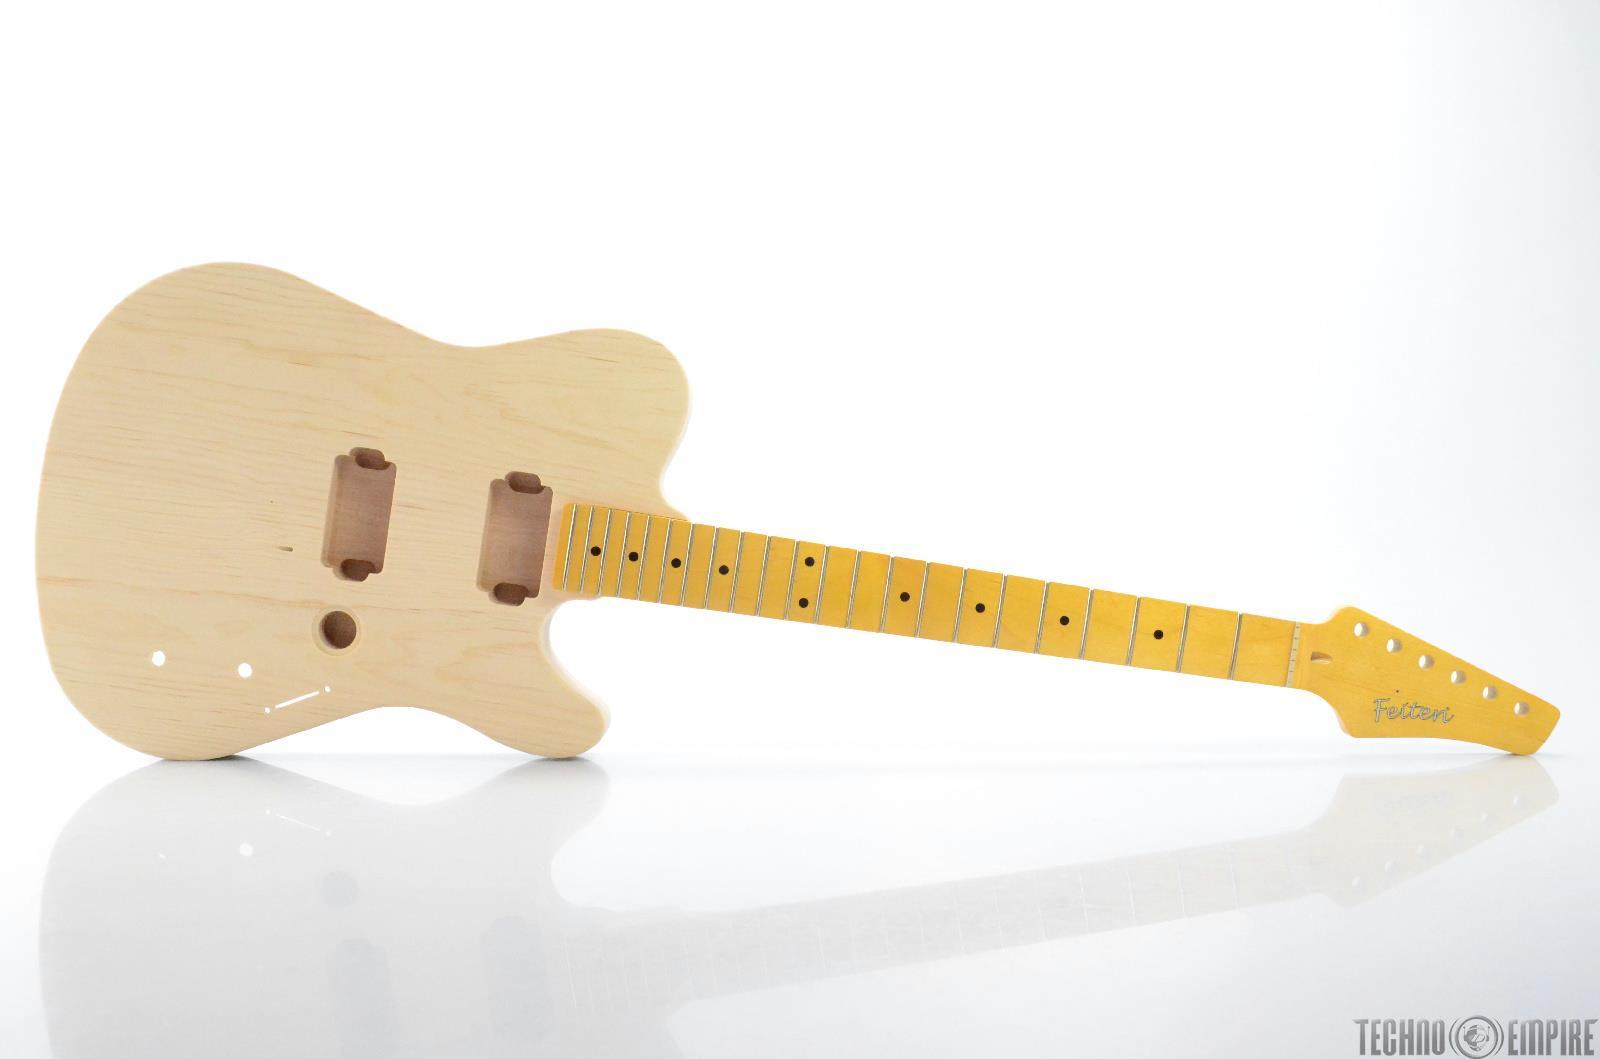 buzz feiten gemini elite pro build your own electric guitar kit 28454 ebay. Black Bedroom Furniture Sets. Home Design Ideas